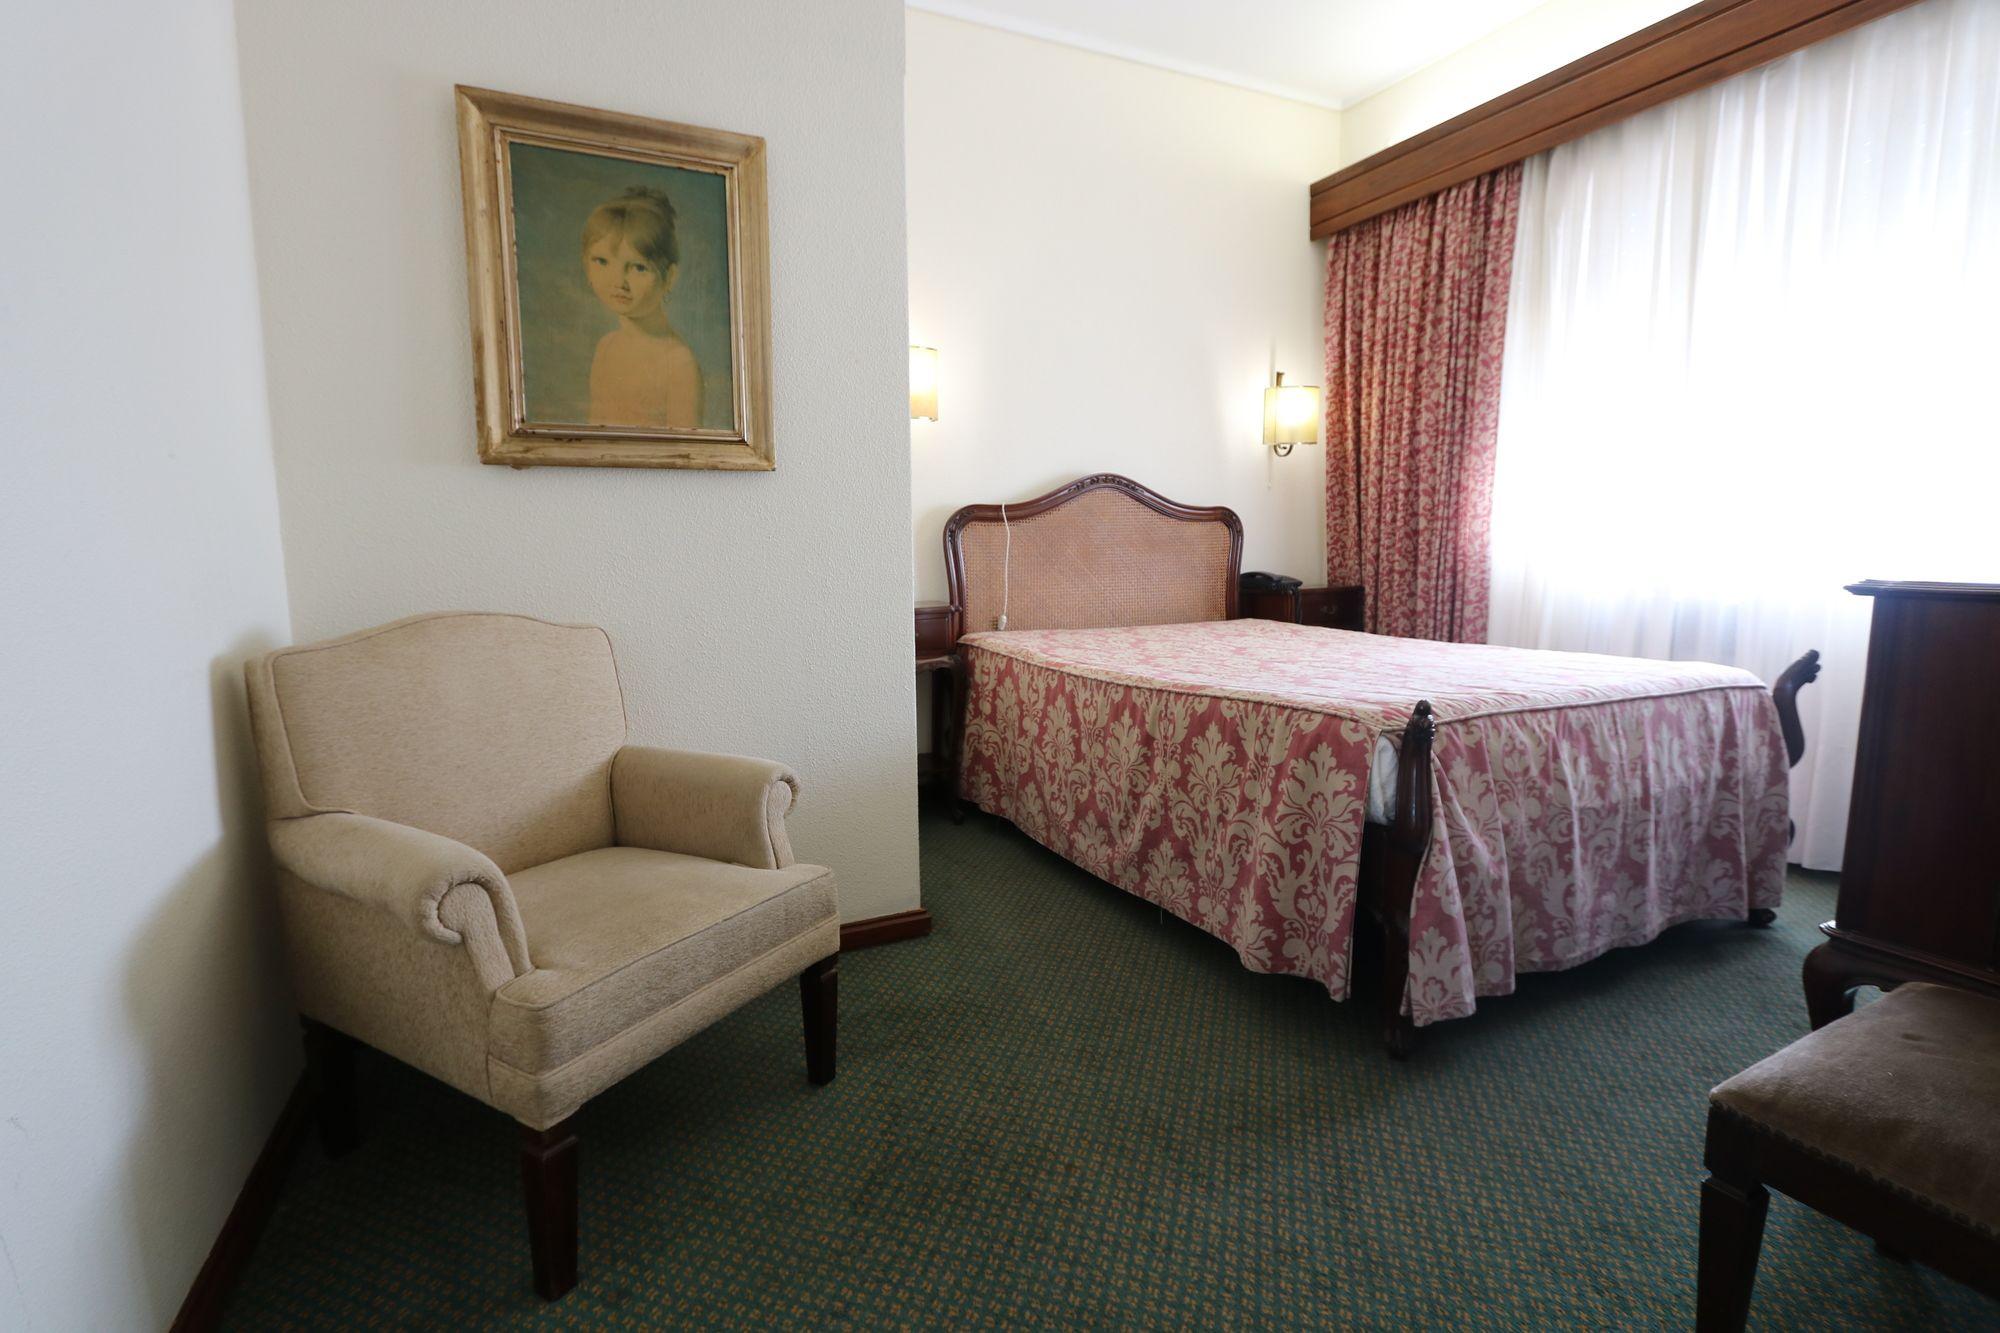 Hotel Imperial - Aveiro